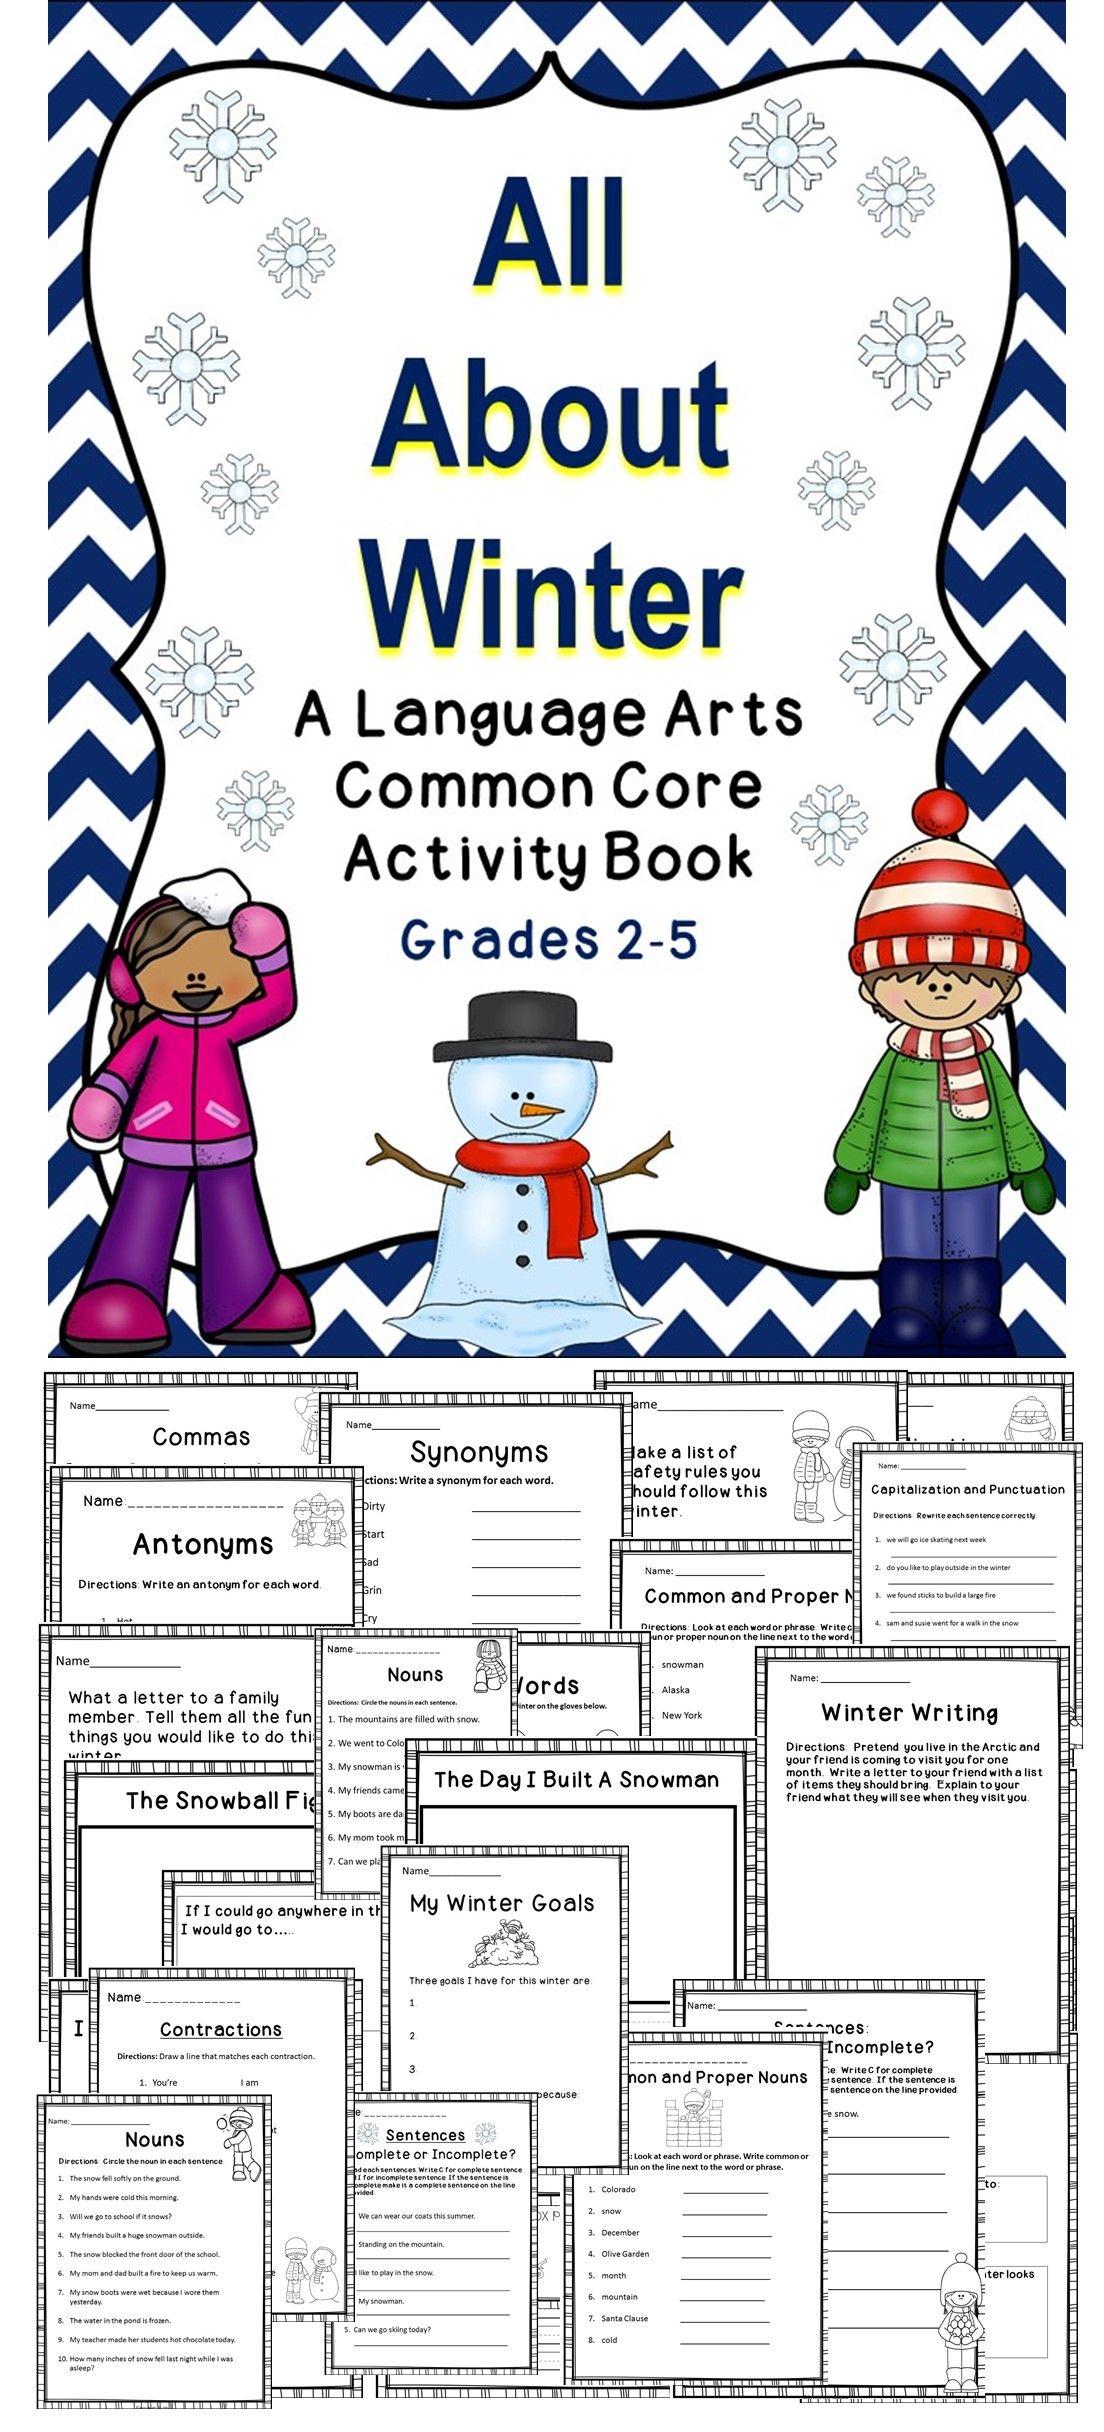 winter teaching teaching language arts art activities educational activities. Black Bedroom Furniture Sets. Home Design Ideas